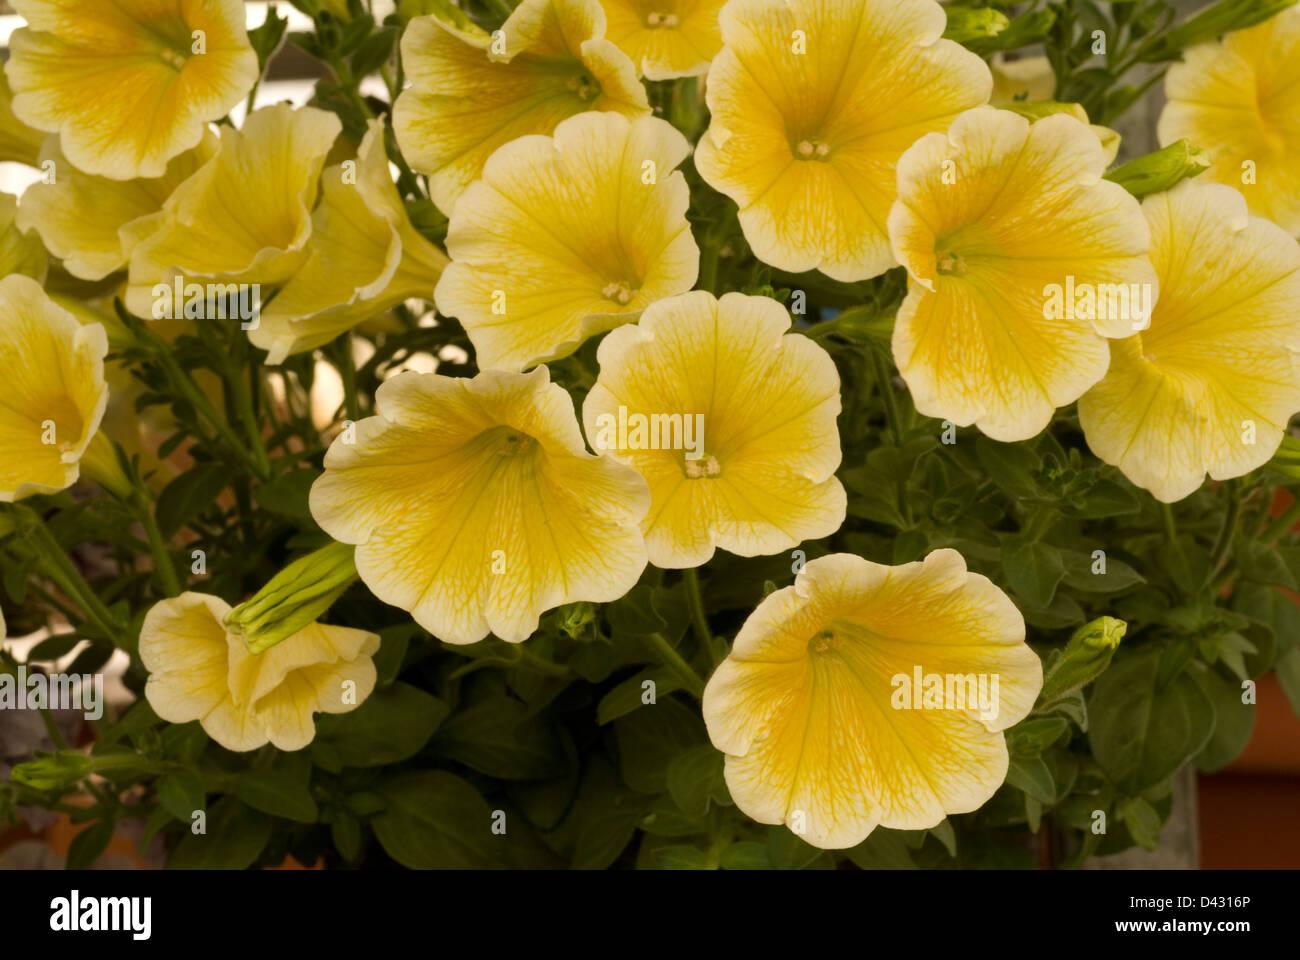 Petunia x hybrida 'Surfinia', Solanaceae - Stock Image